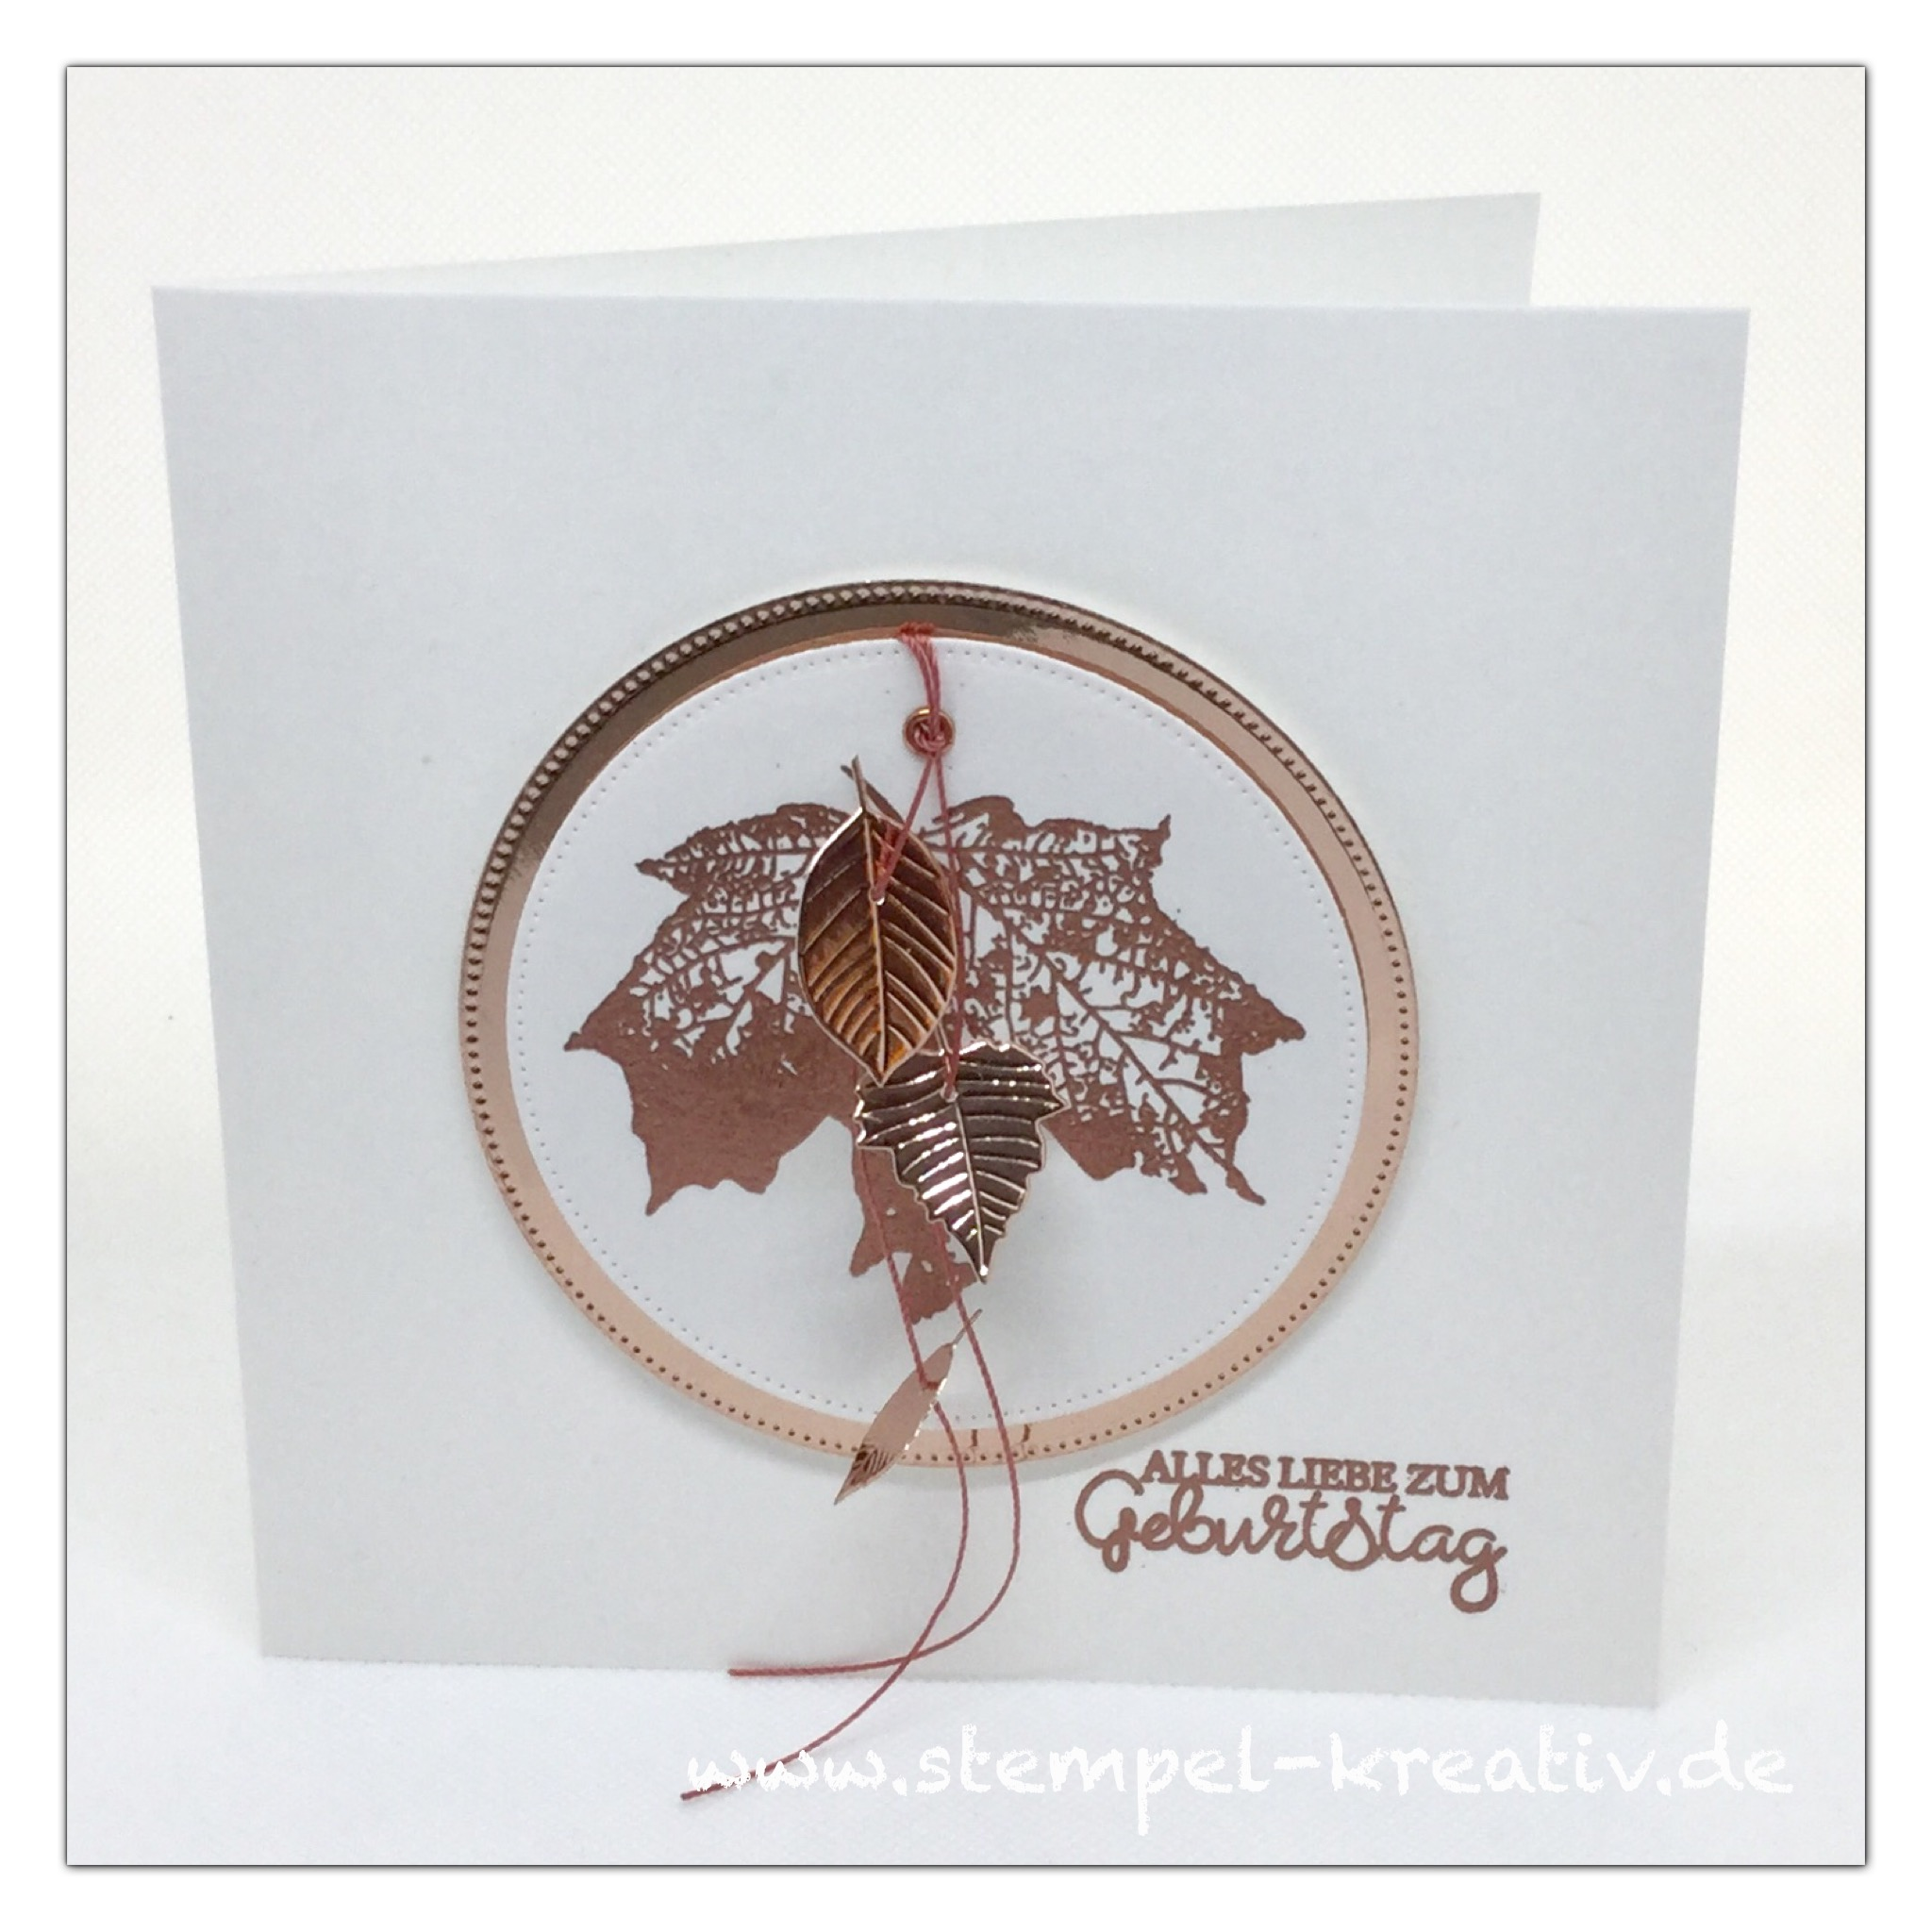 Glückwunschkarte Ahornblatt Frohe Herbstzeit